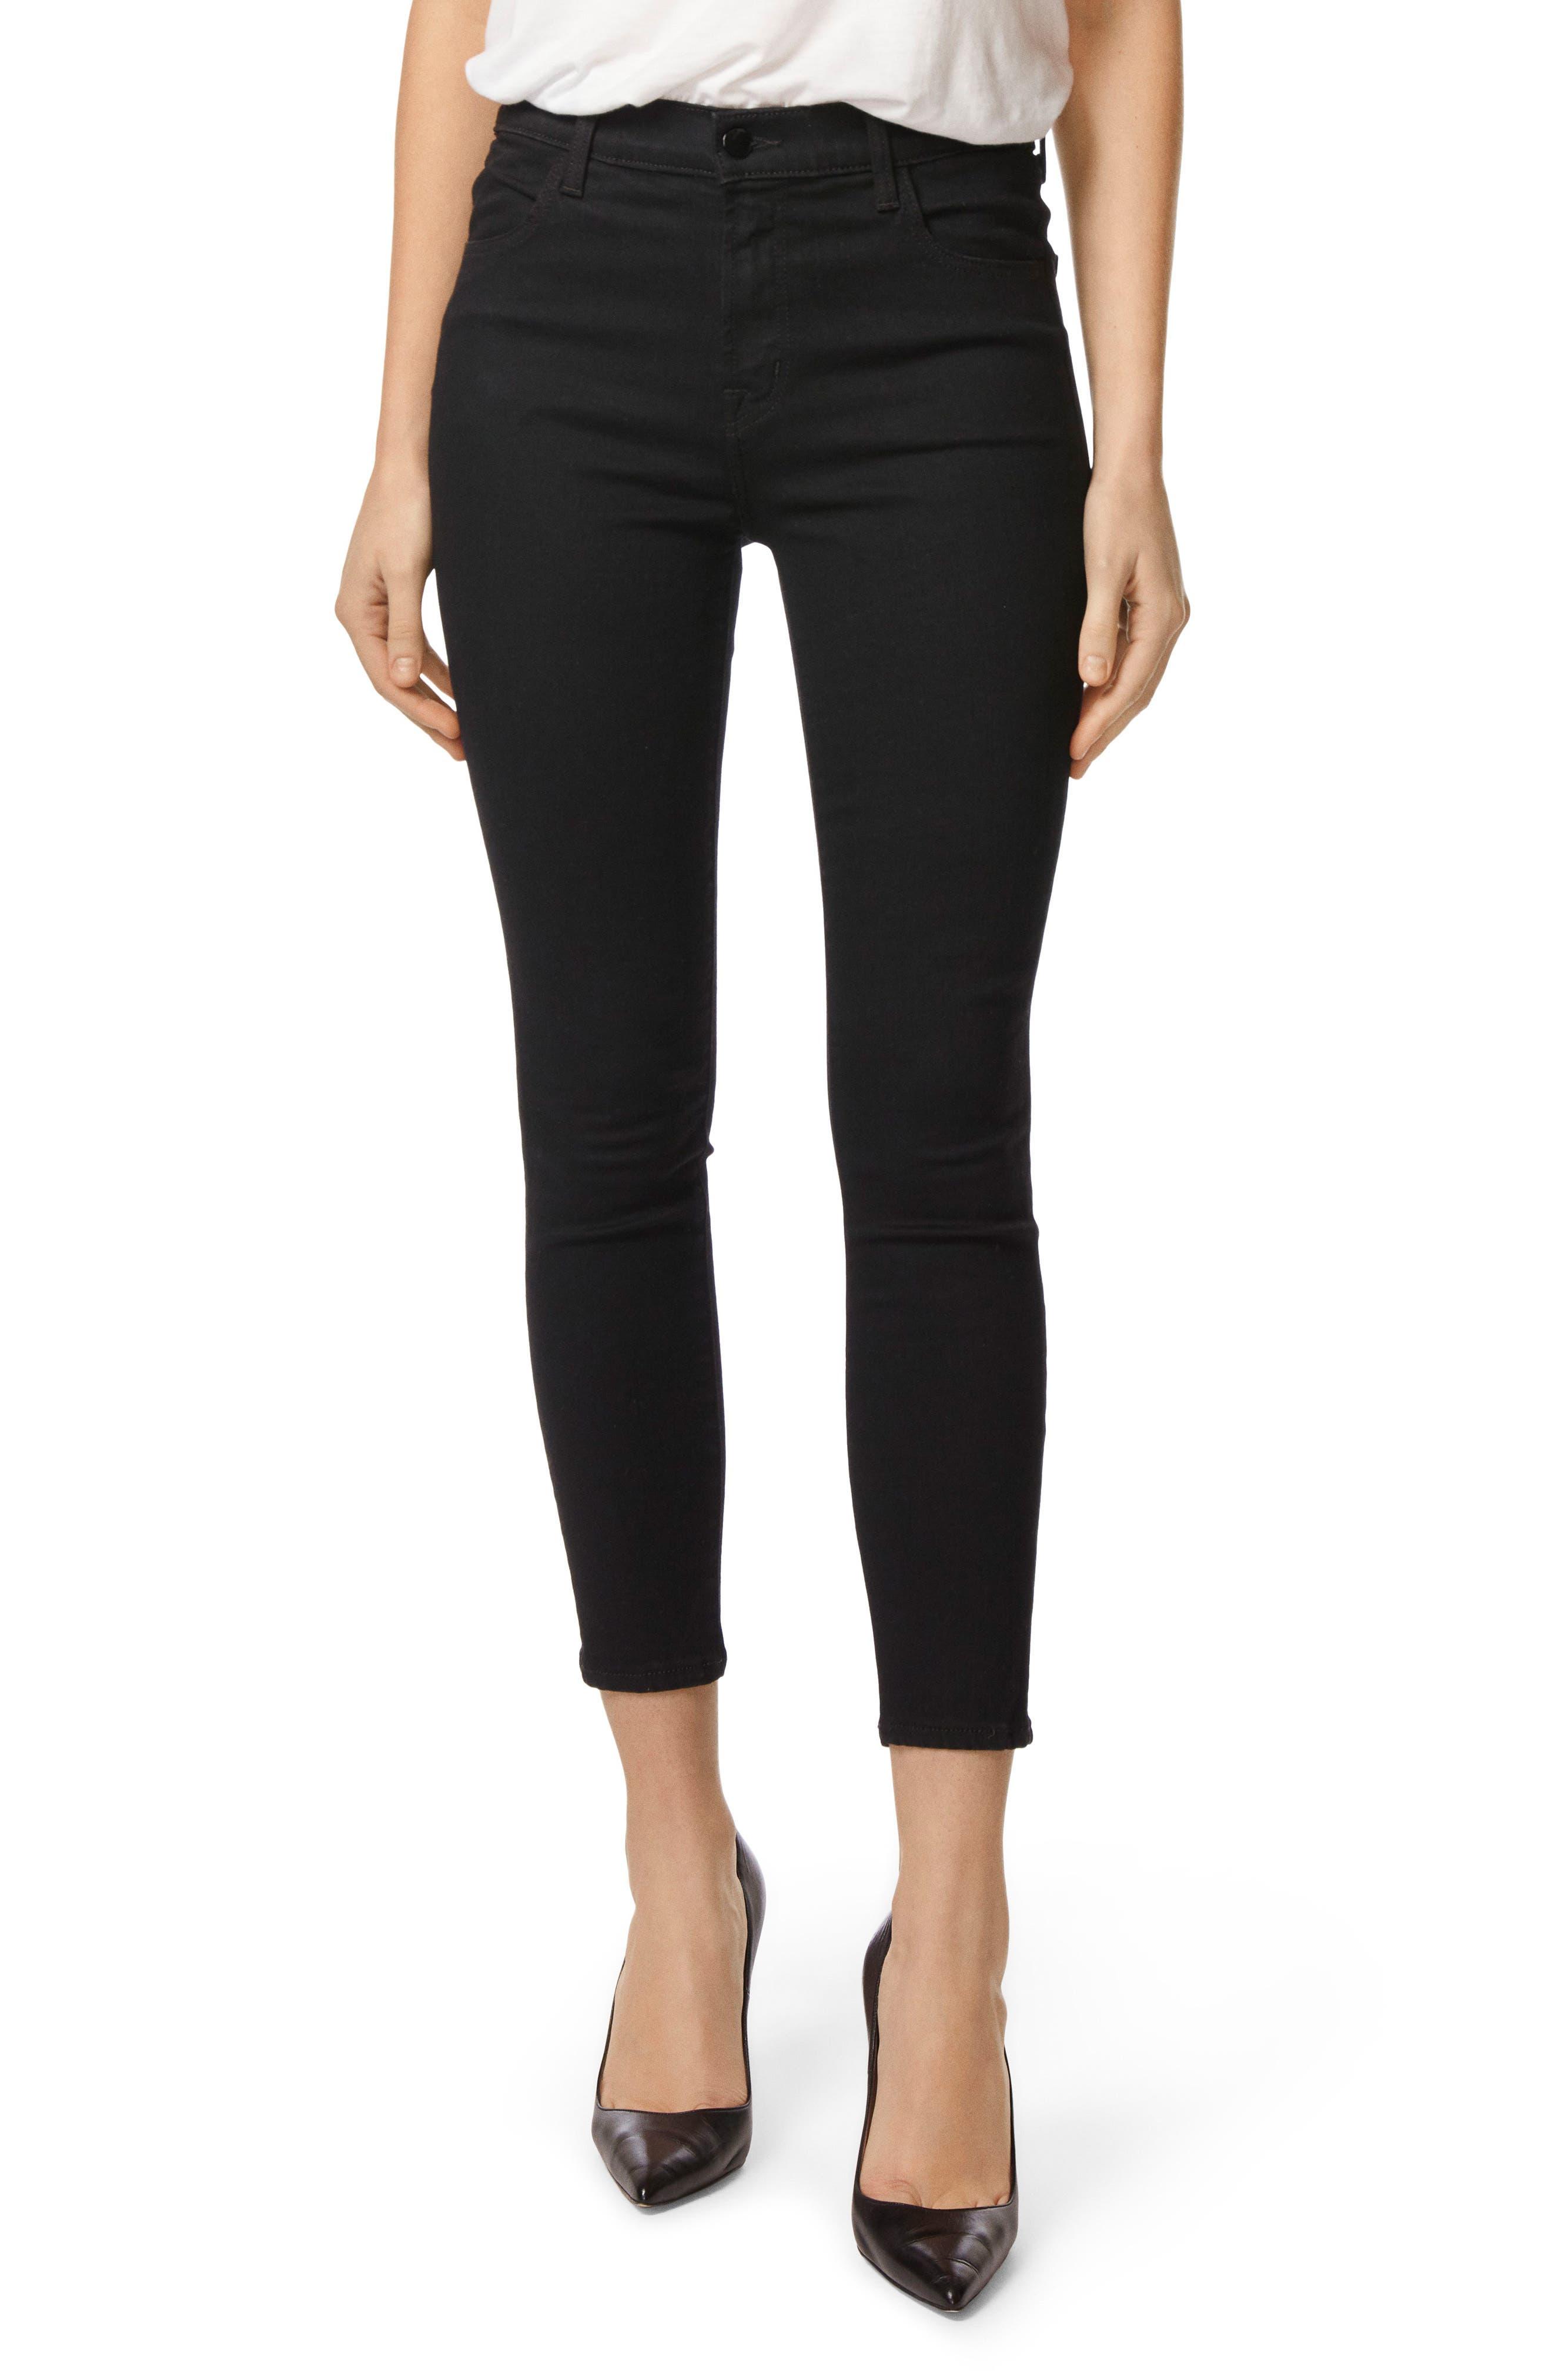 Main Image - J Brand Alana High Waist Crop Skinny Jeans (Vanity)